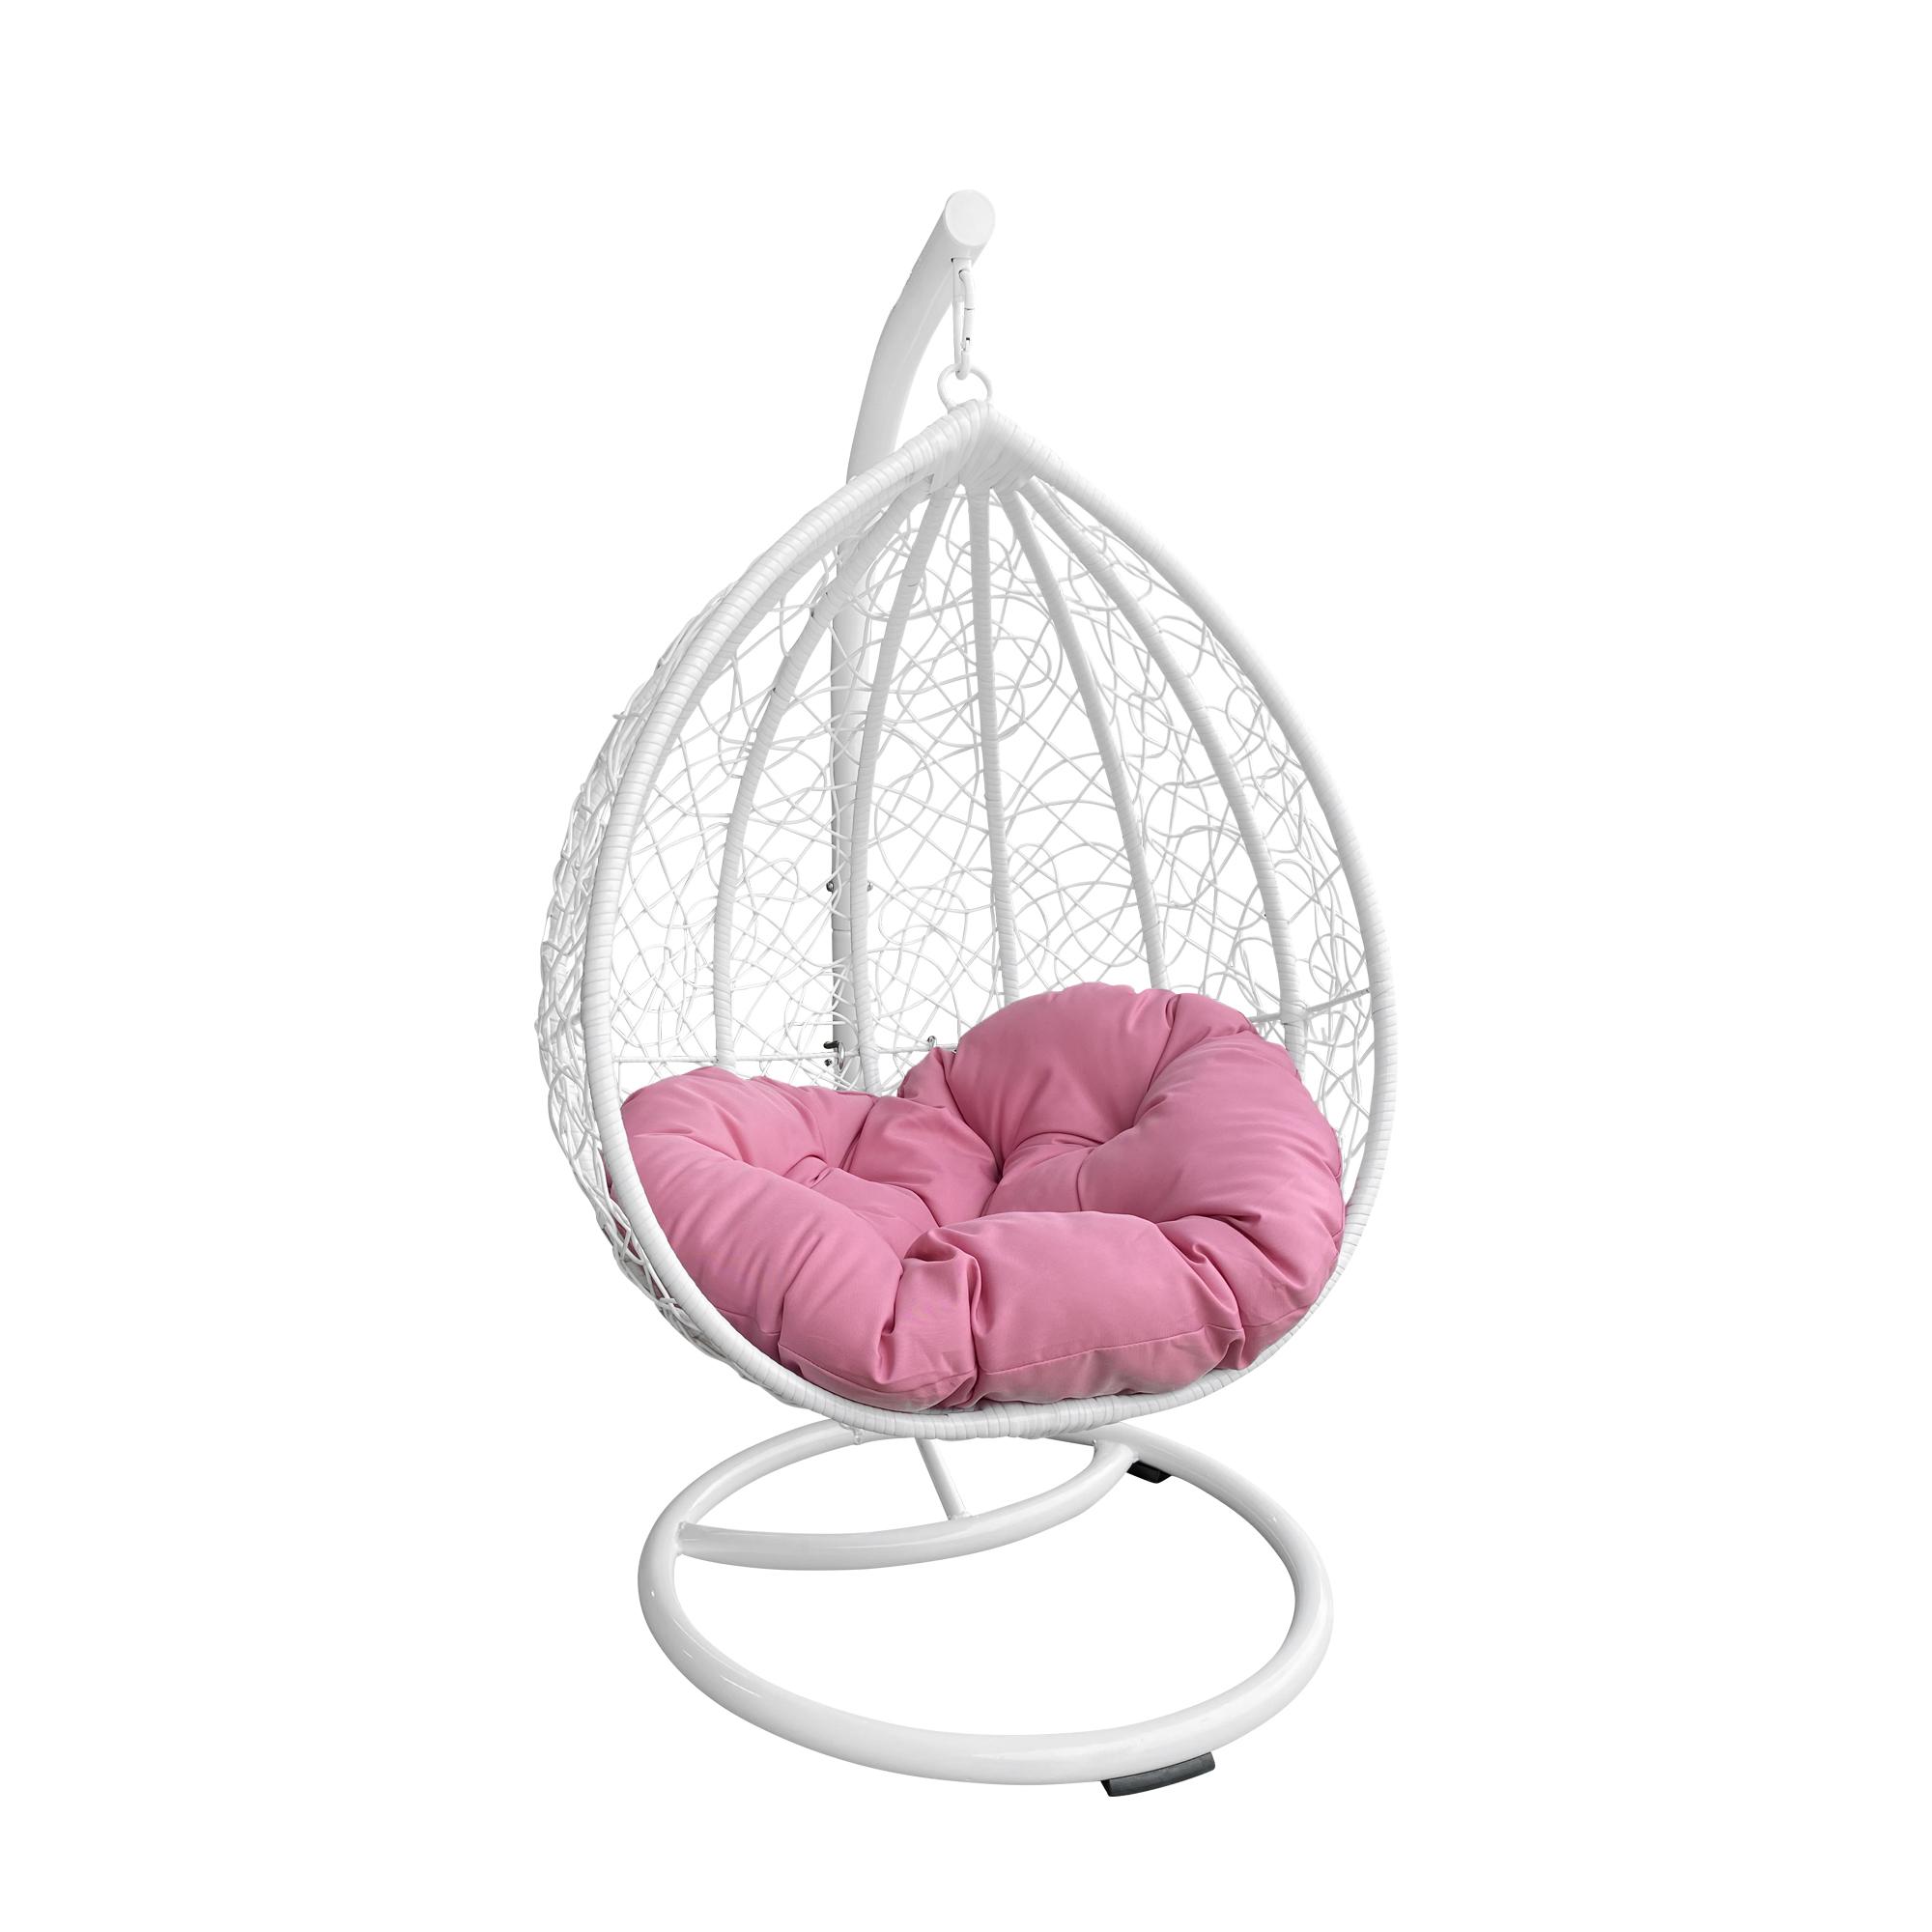 M&M Sales Enterprises MM00147-PNK Children Swoon Pod Hanging Chair Swing, Pink